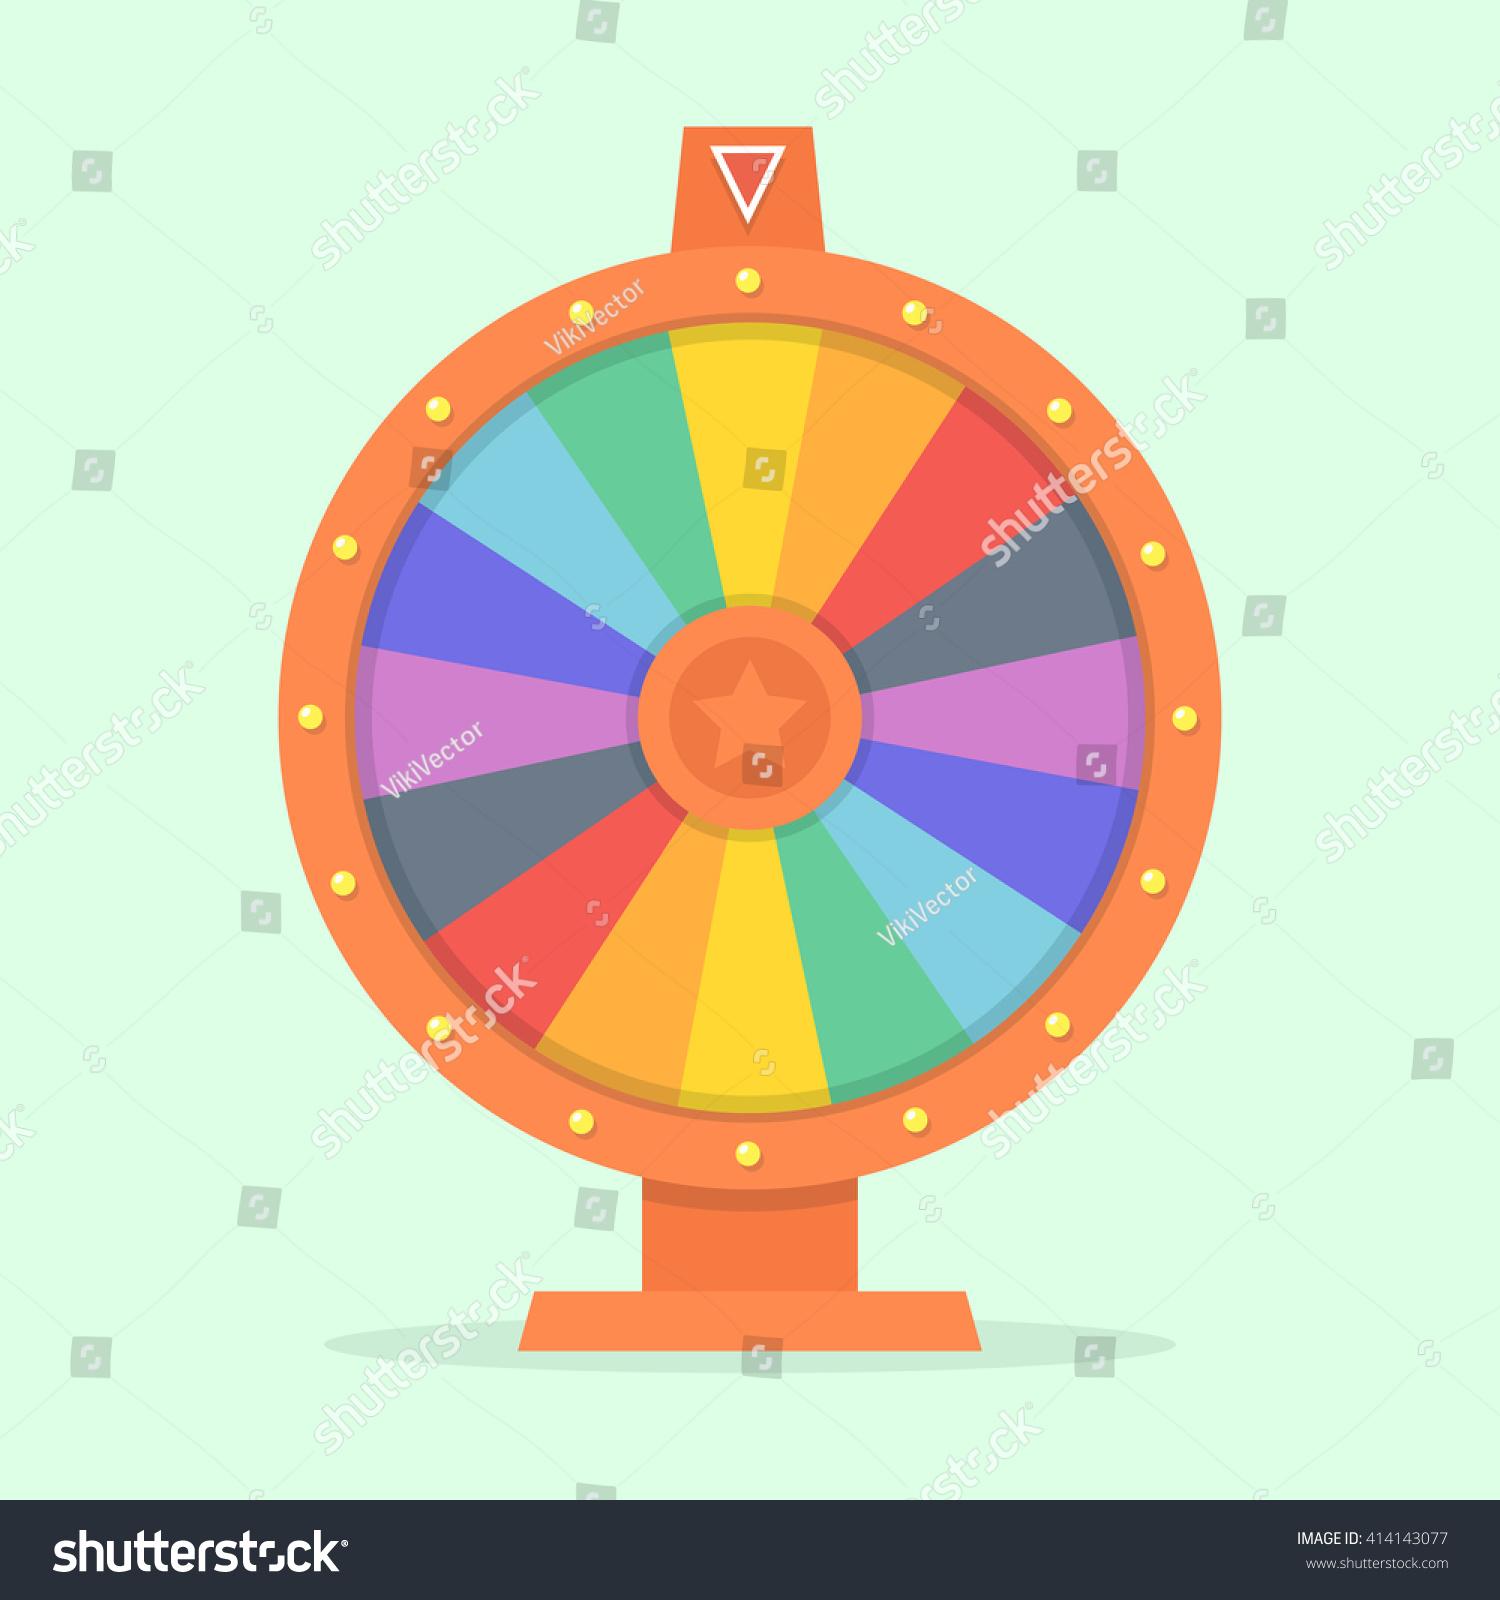 wheel fortune vector illustration flat colorful stock vector 414143077 shutterstock. Black Bedroom Furniture Sets. Home Design Ideas